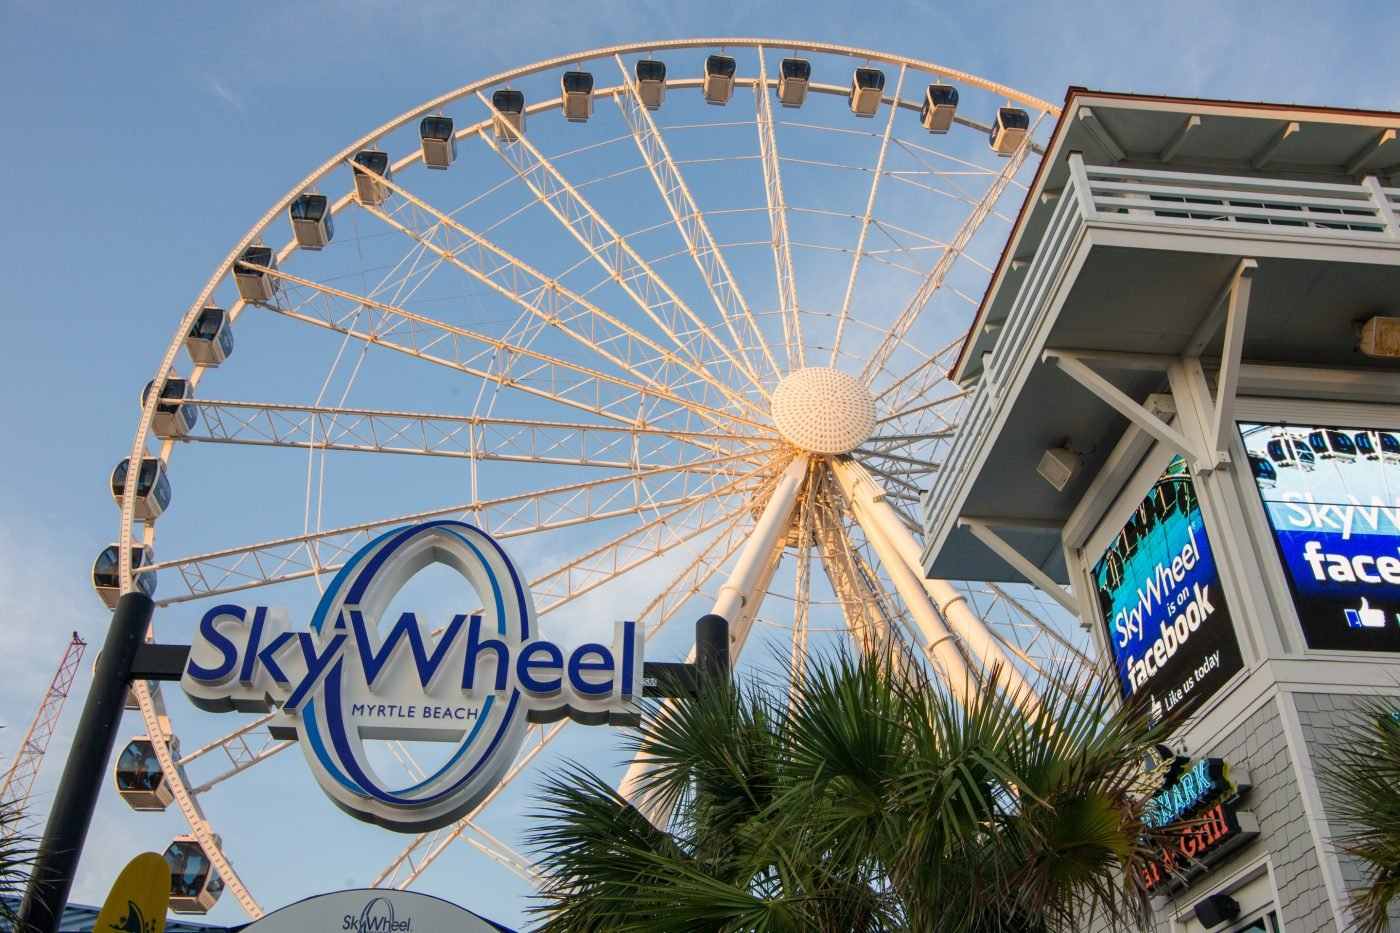 Myrtle Beach Skywheel Everything You